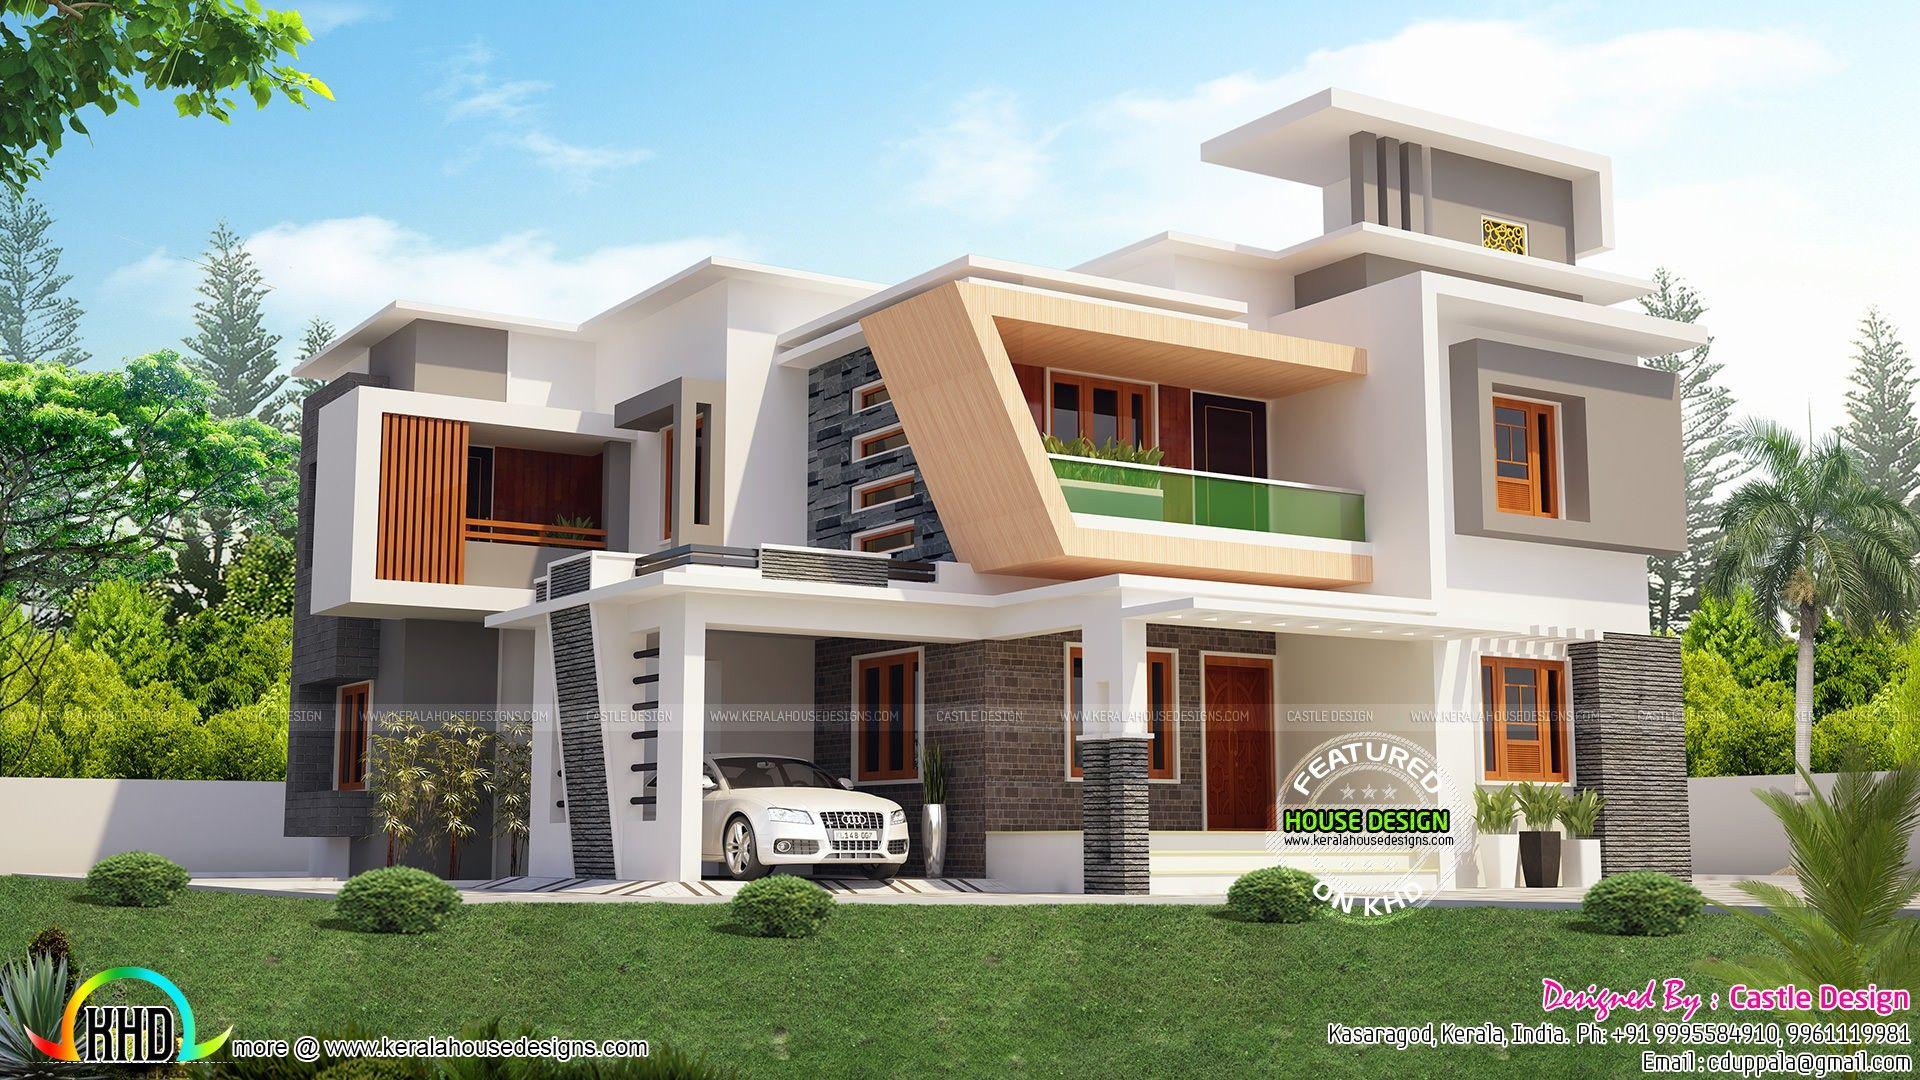 Simple Terrace House Design Philippines In 2020 Bungalow House Design Craftsman Style House Plans Duplex House Design